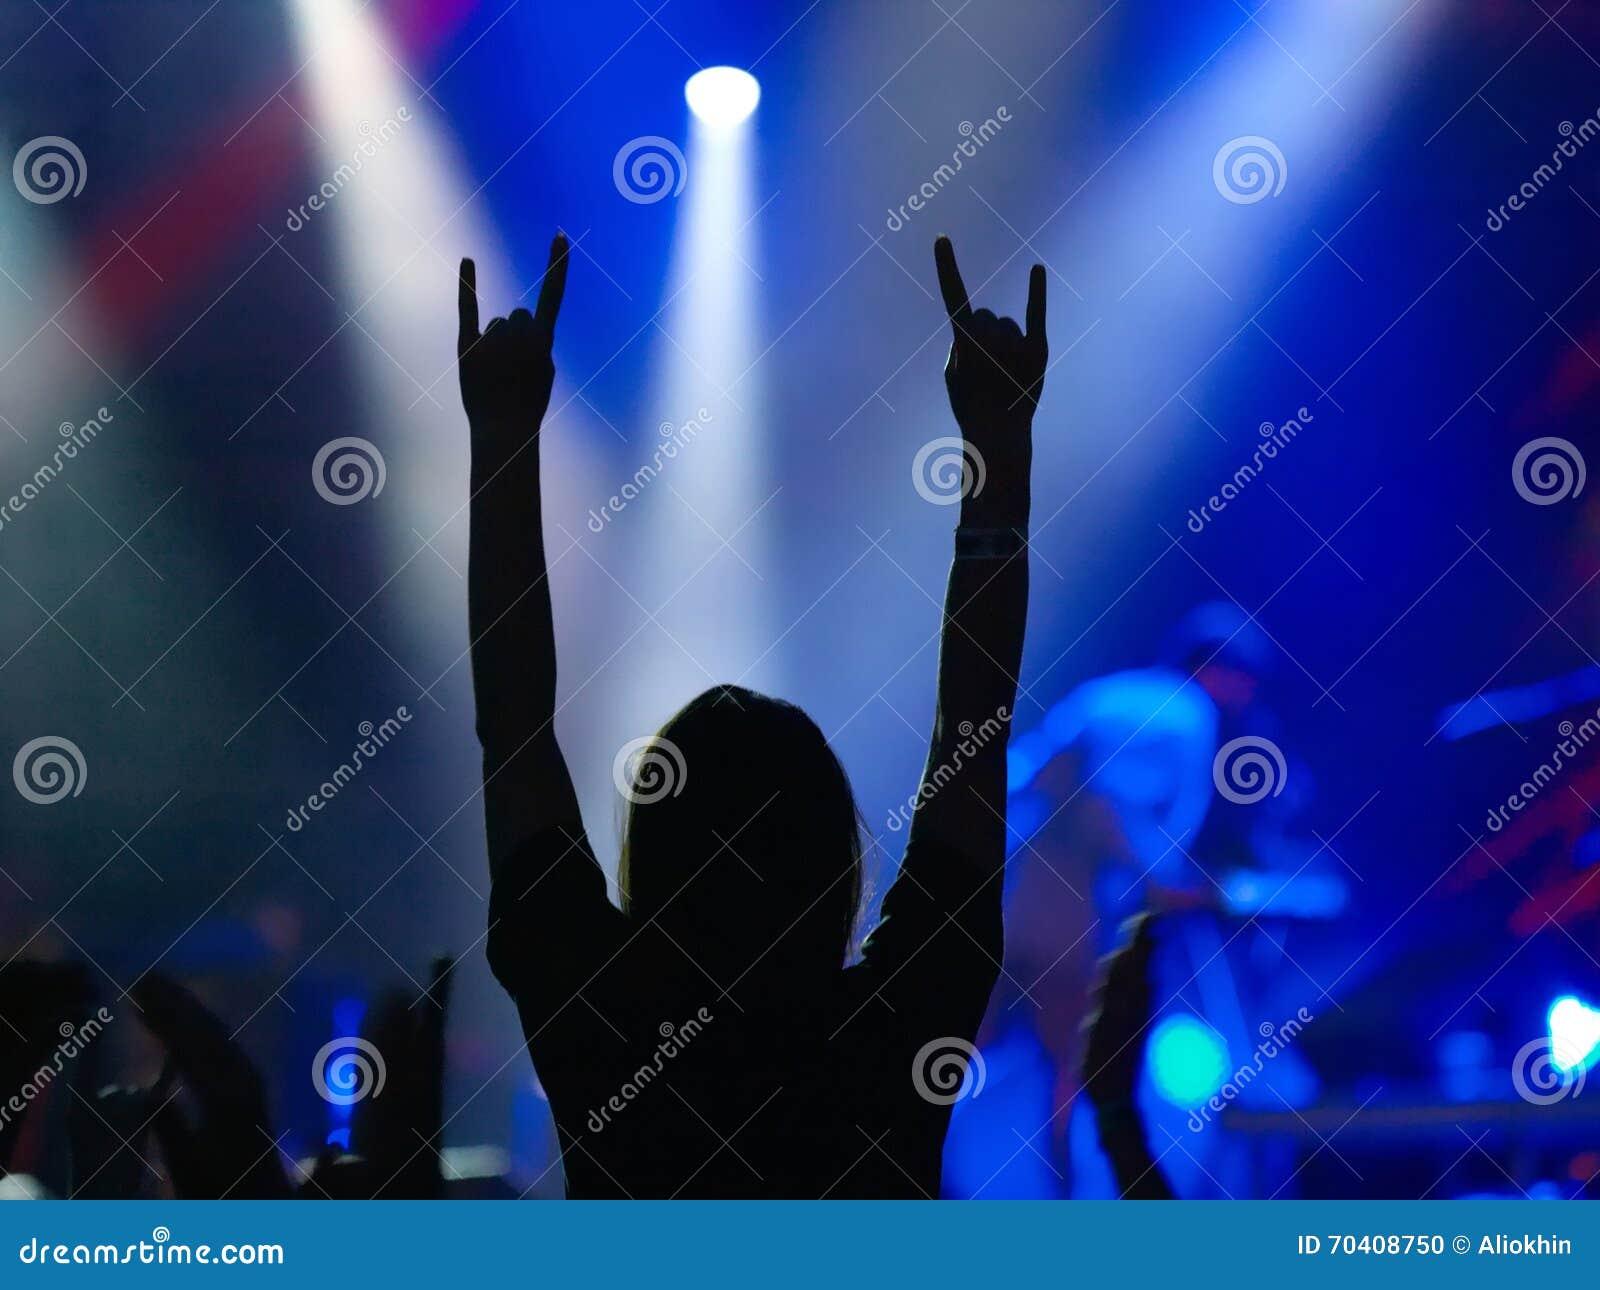 Pics photos rock concert background - Girl Raising Up Hands On Rock Concert Stock Photo